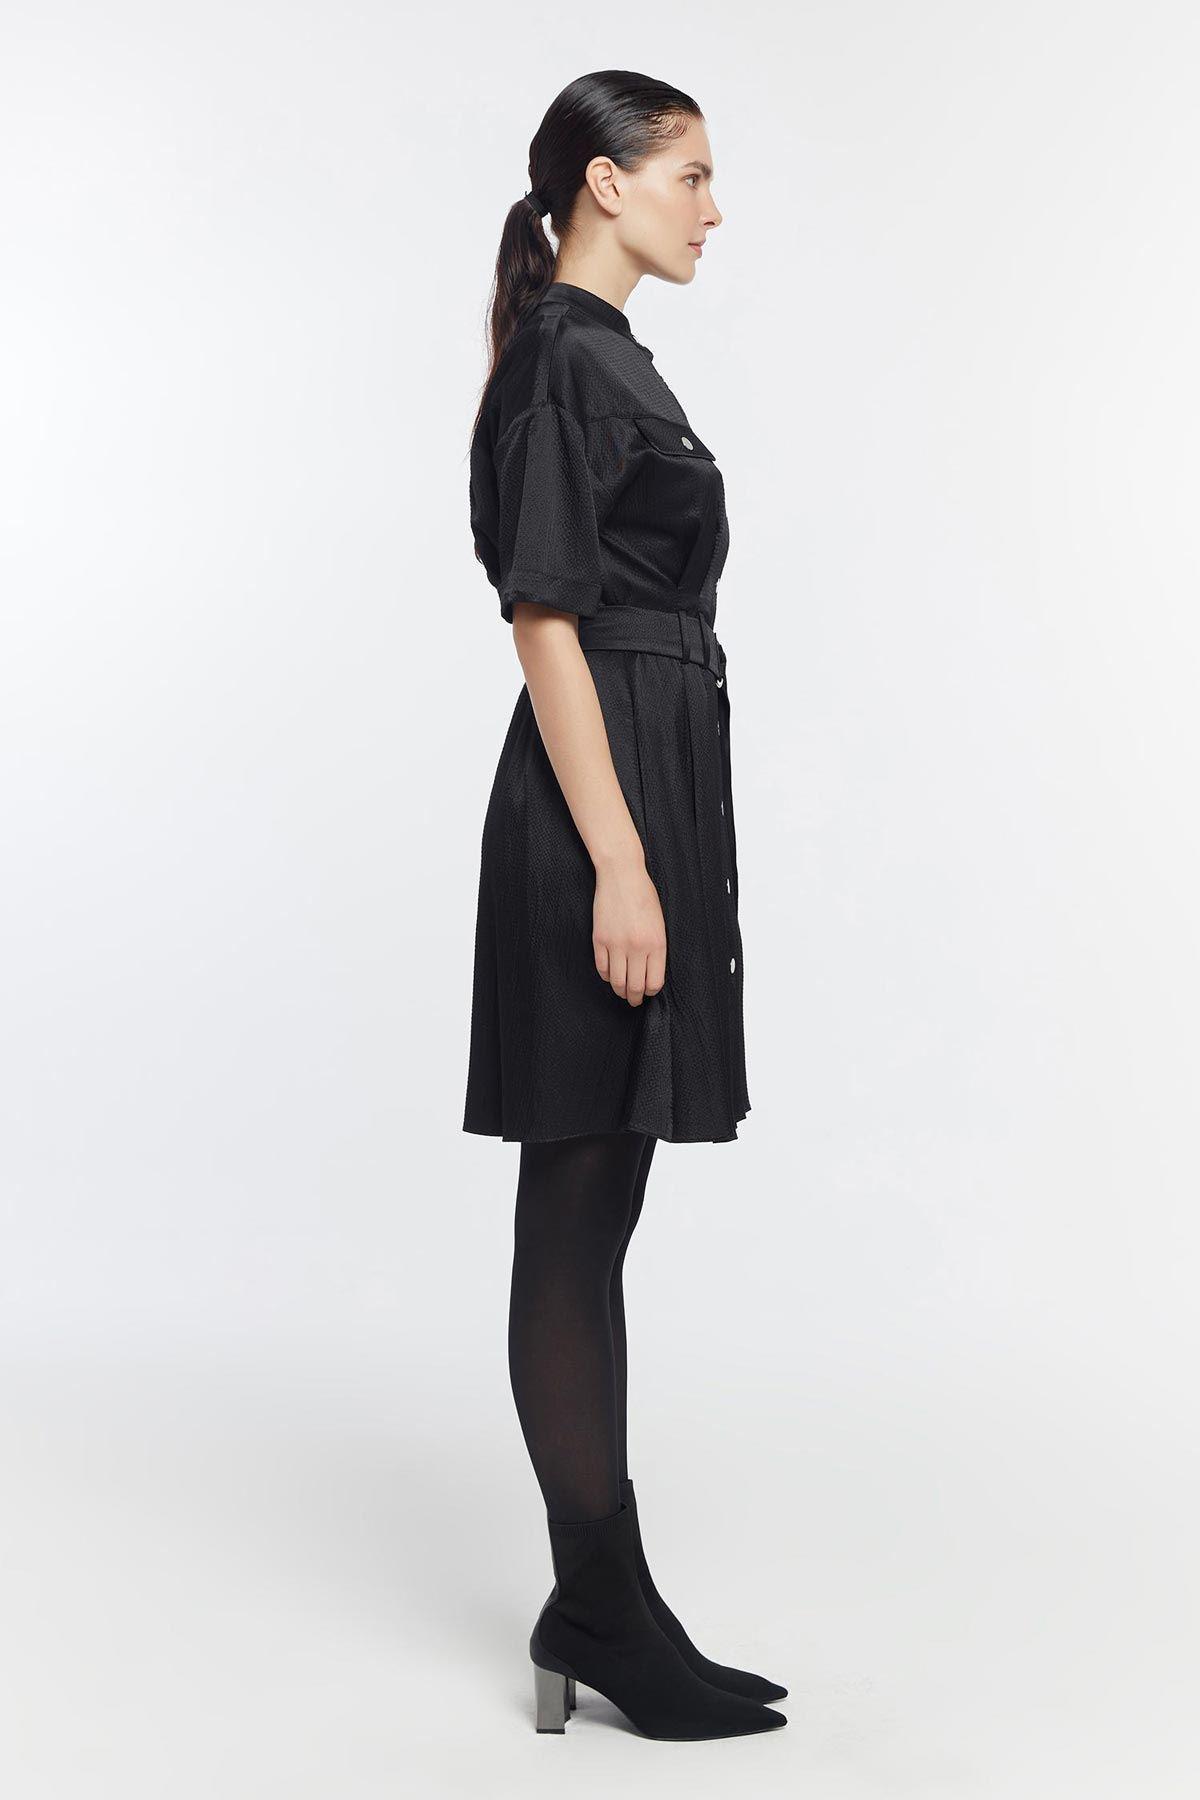 Düğme kapama kemerli elbise Siyah